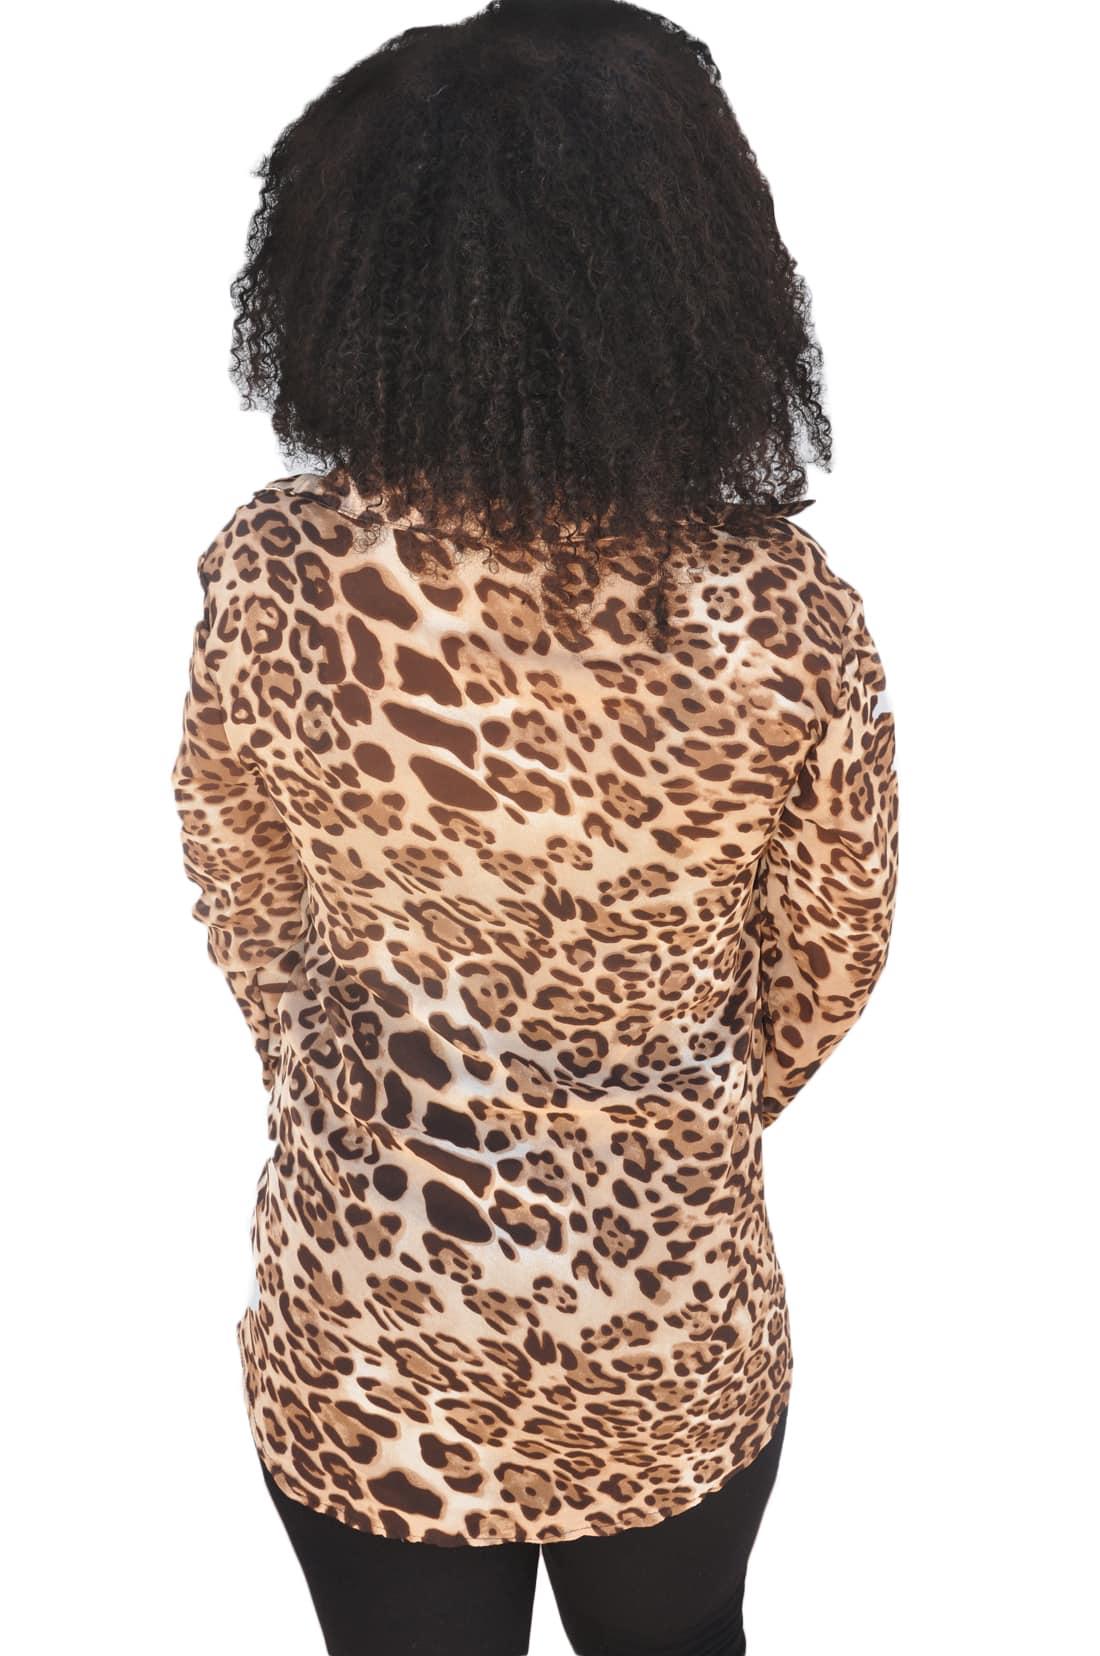 M0199 animalprint3 Blouses Tops Shirts maureens.com boutique